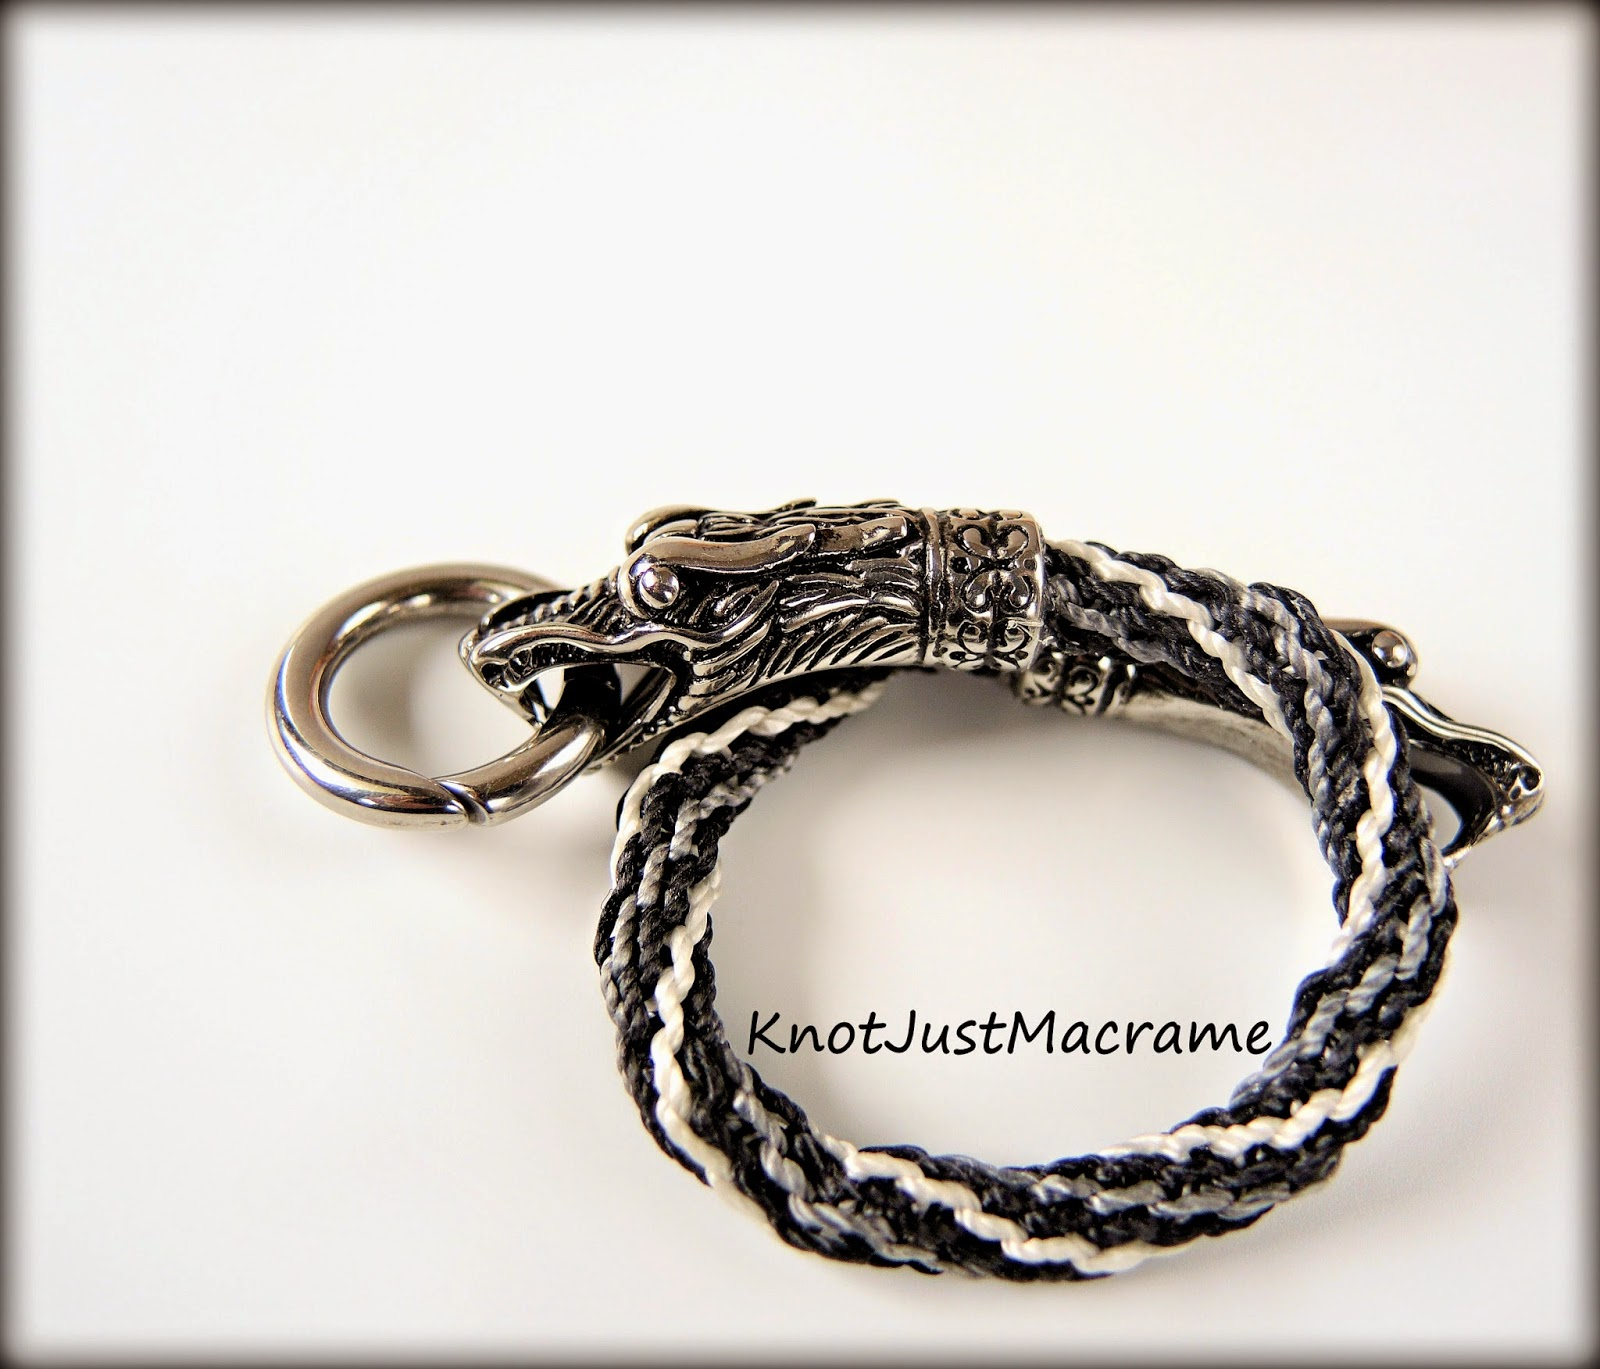 Micro macrame bracelet with dragon heads closure by Sherri Stokey of Knot Just Macrame.